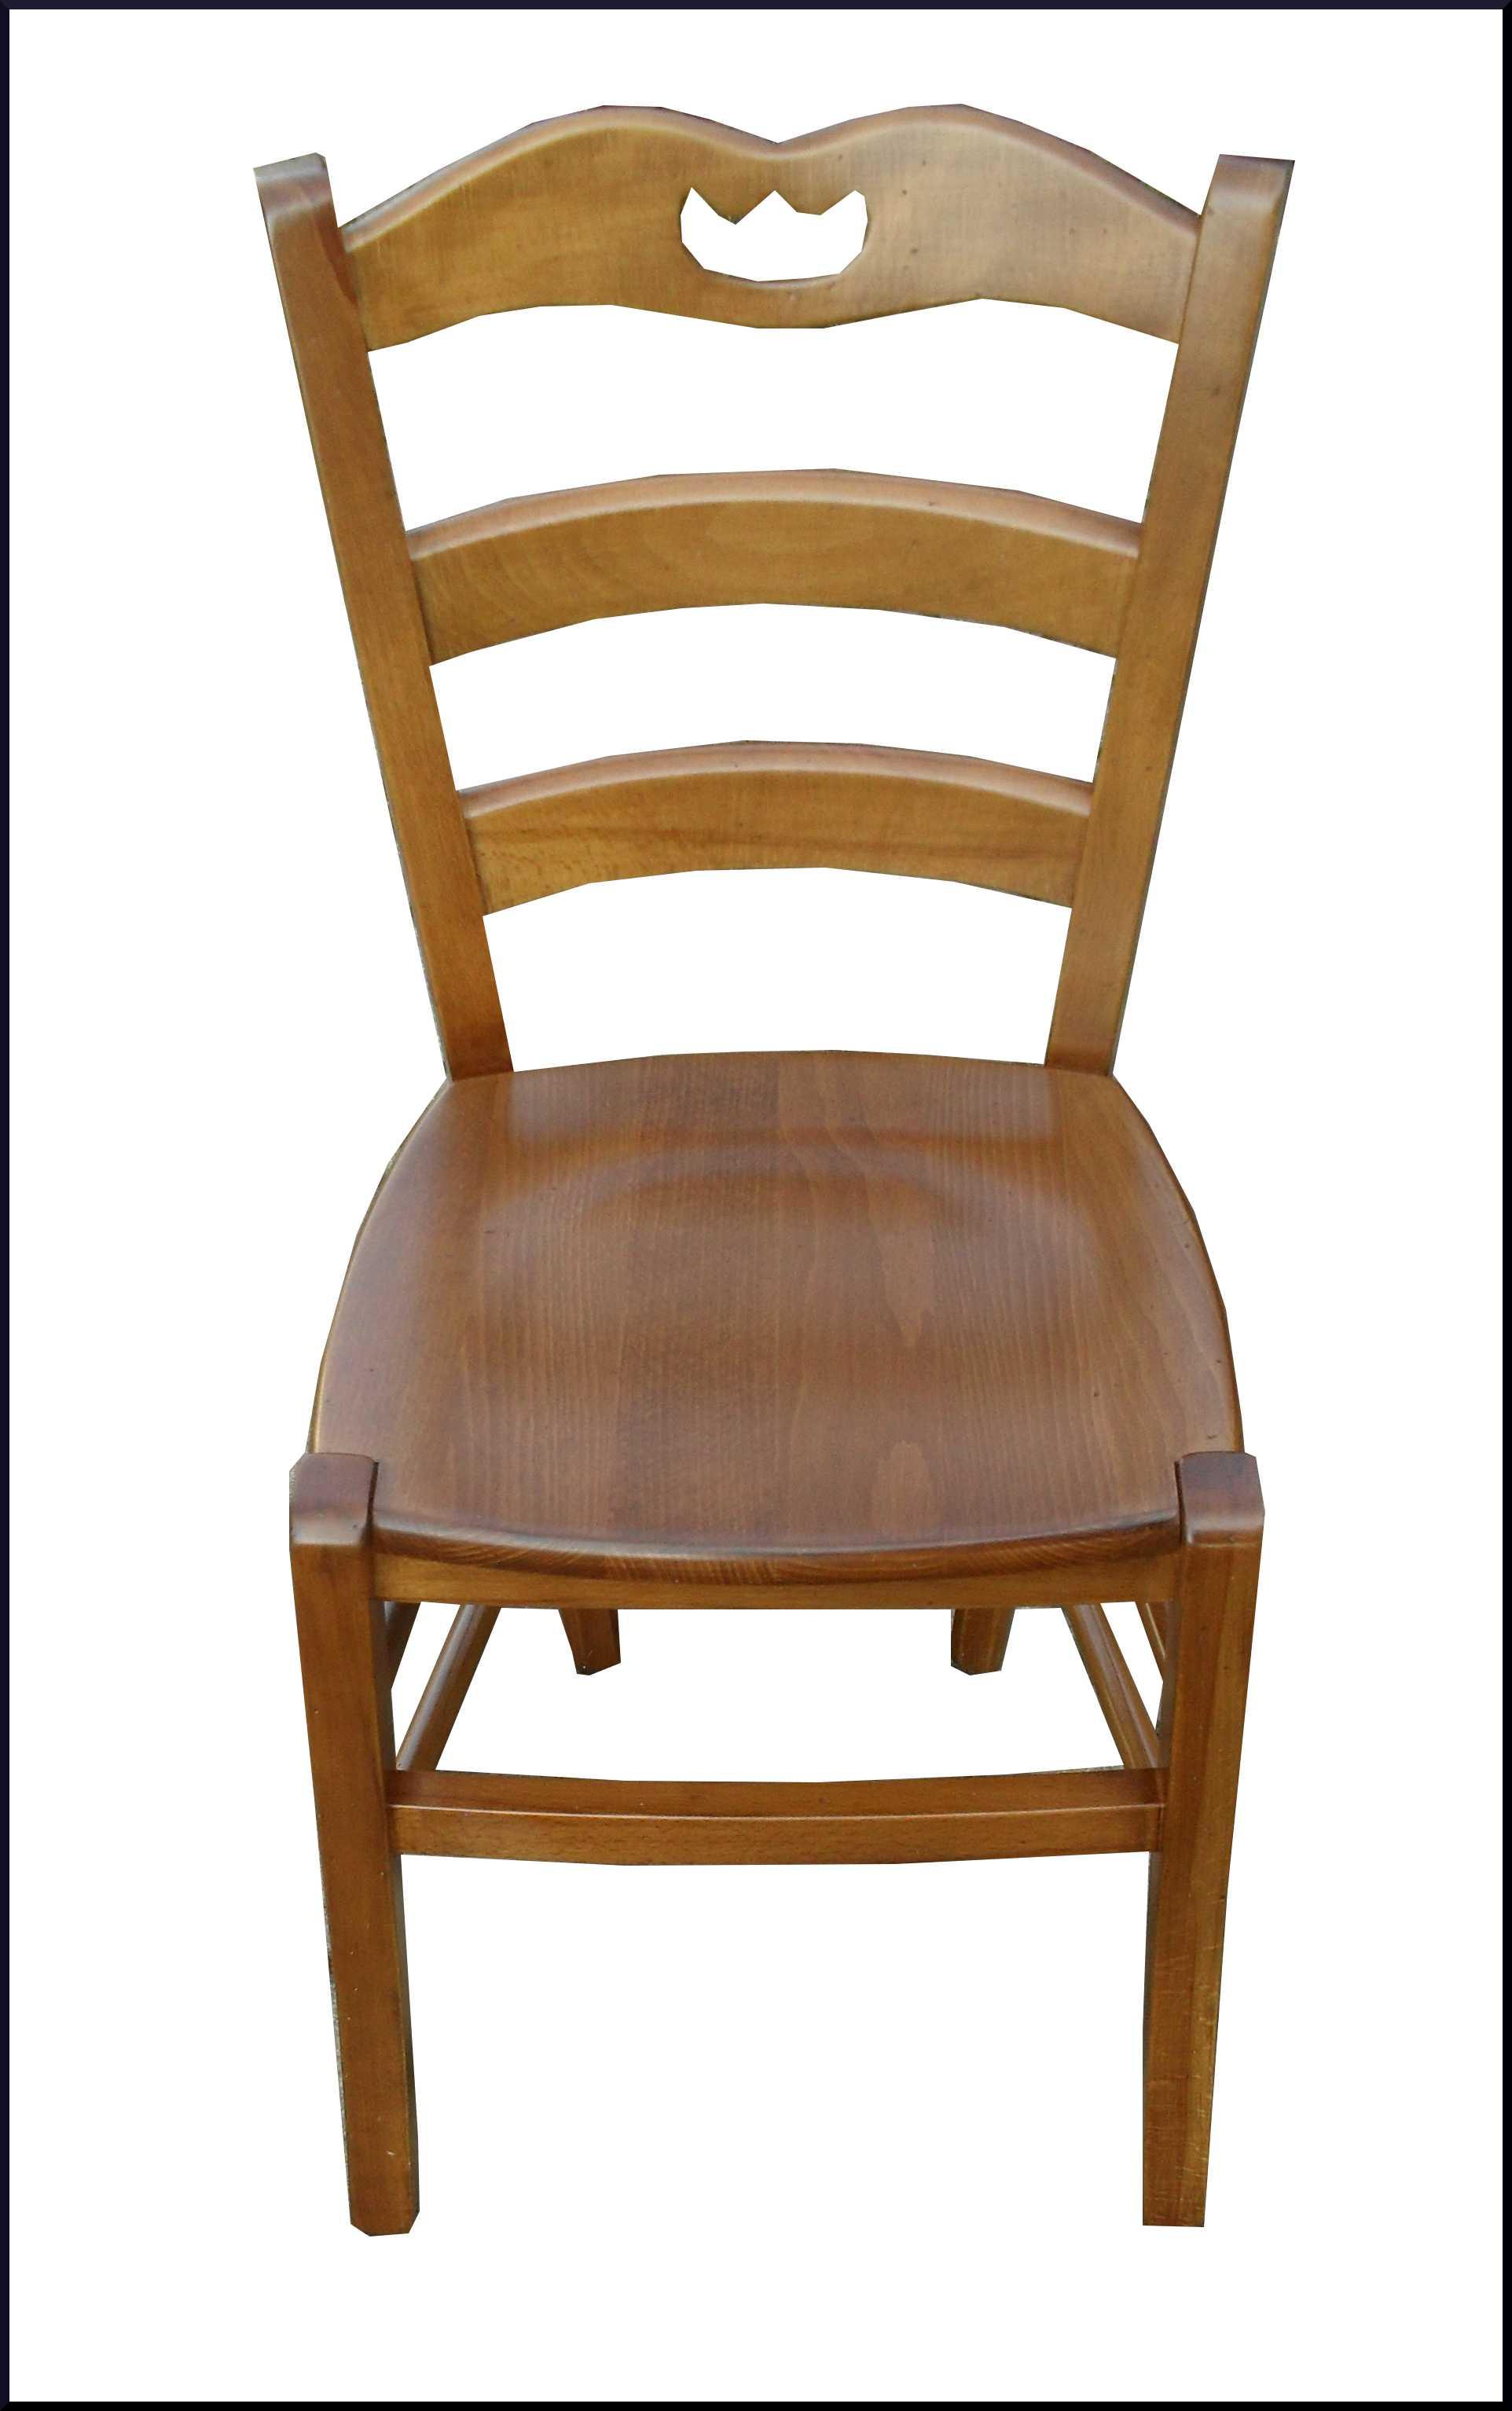 Sedia campagnola con seduta in legno